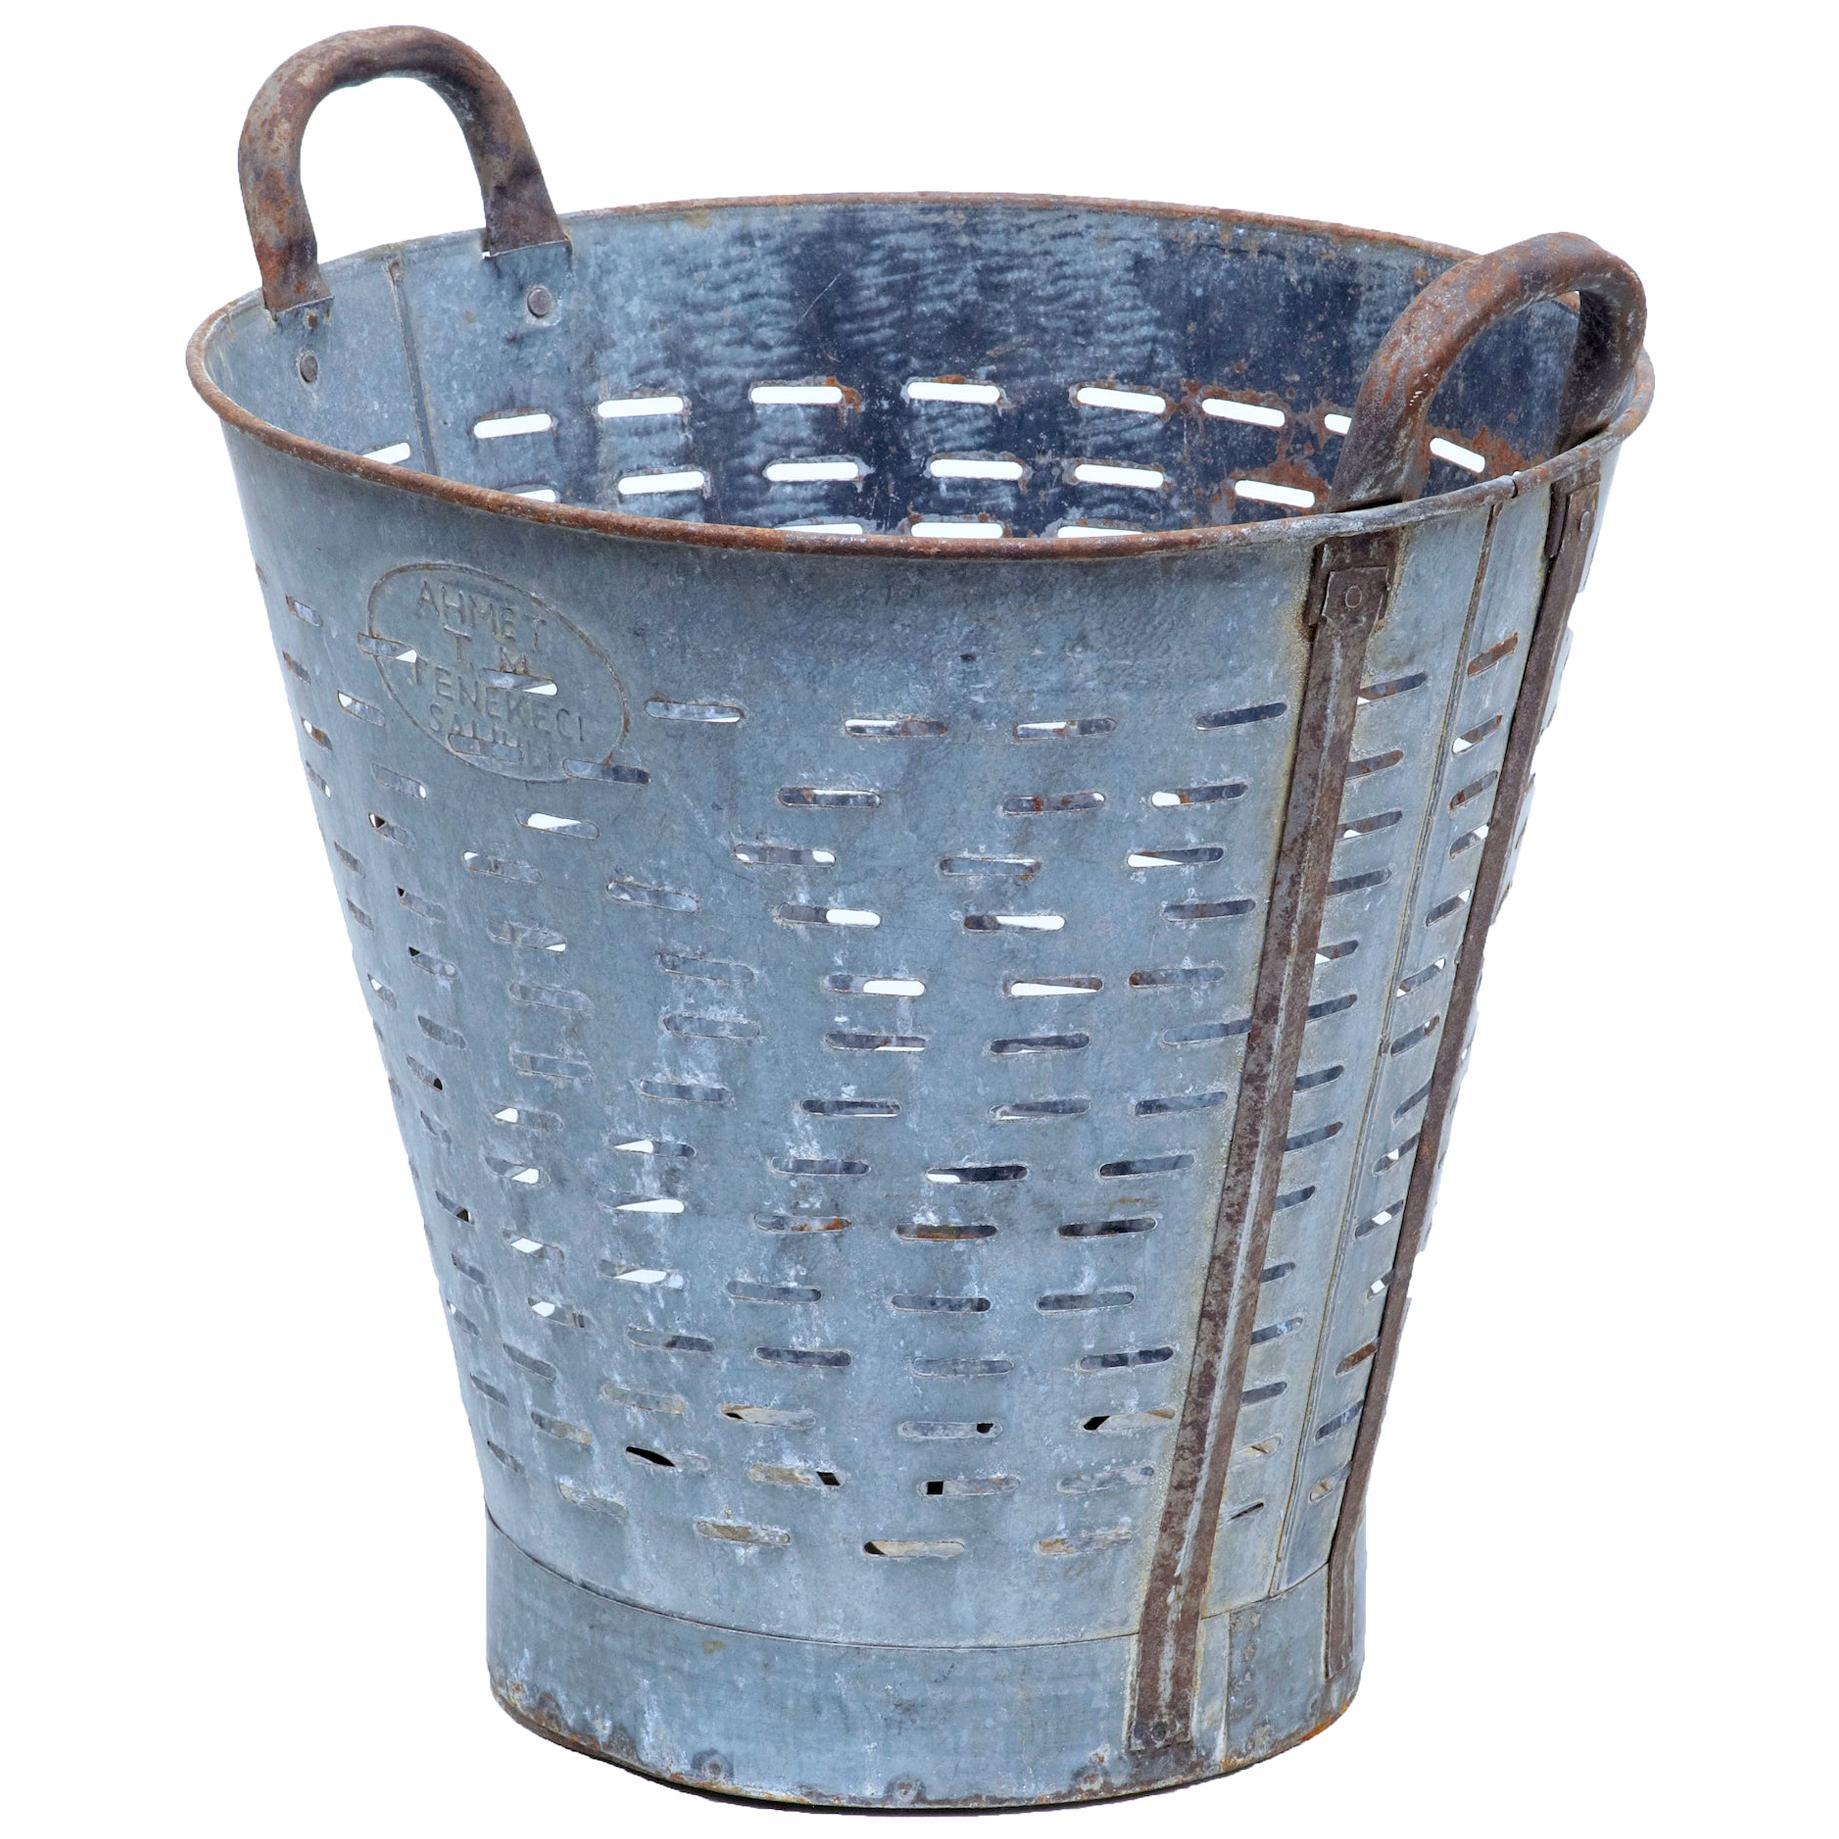 Early 20th Century Industrial Metal Basket